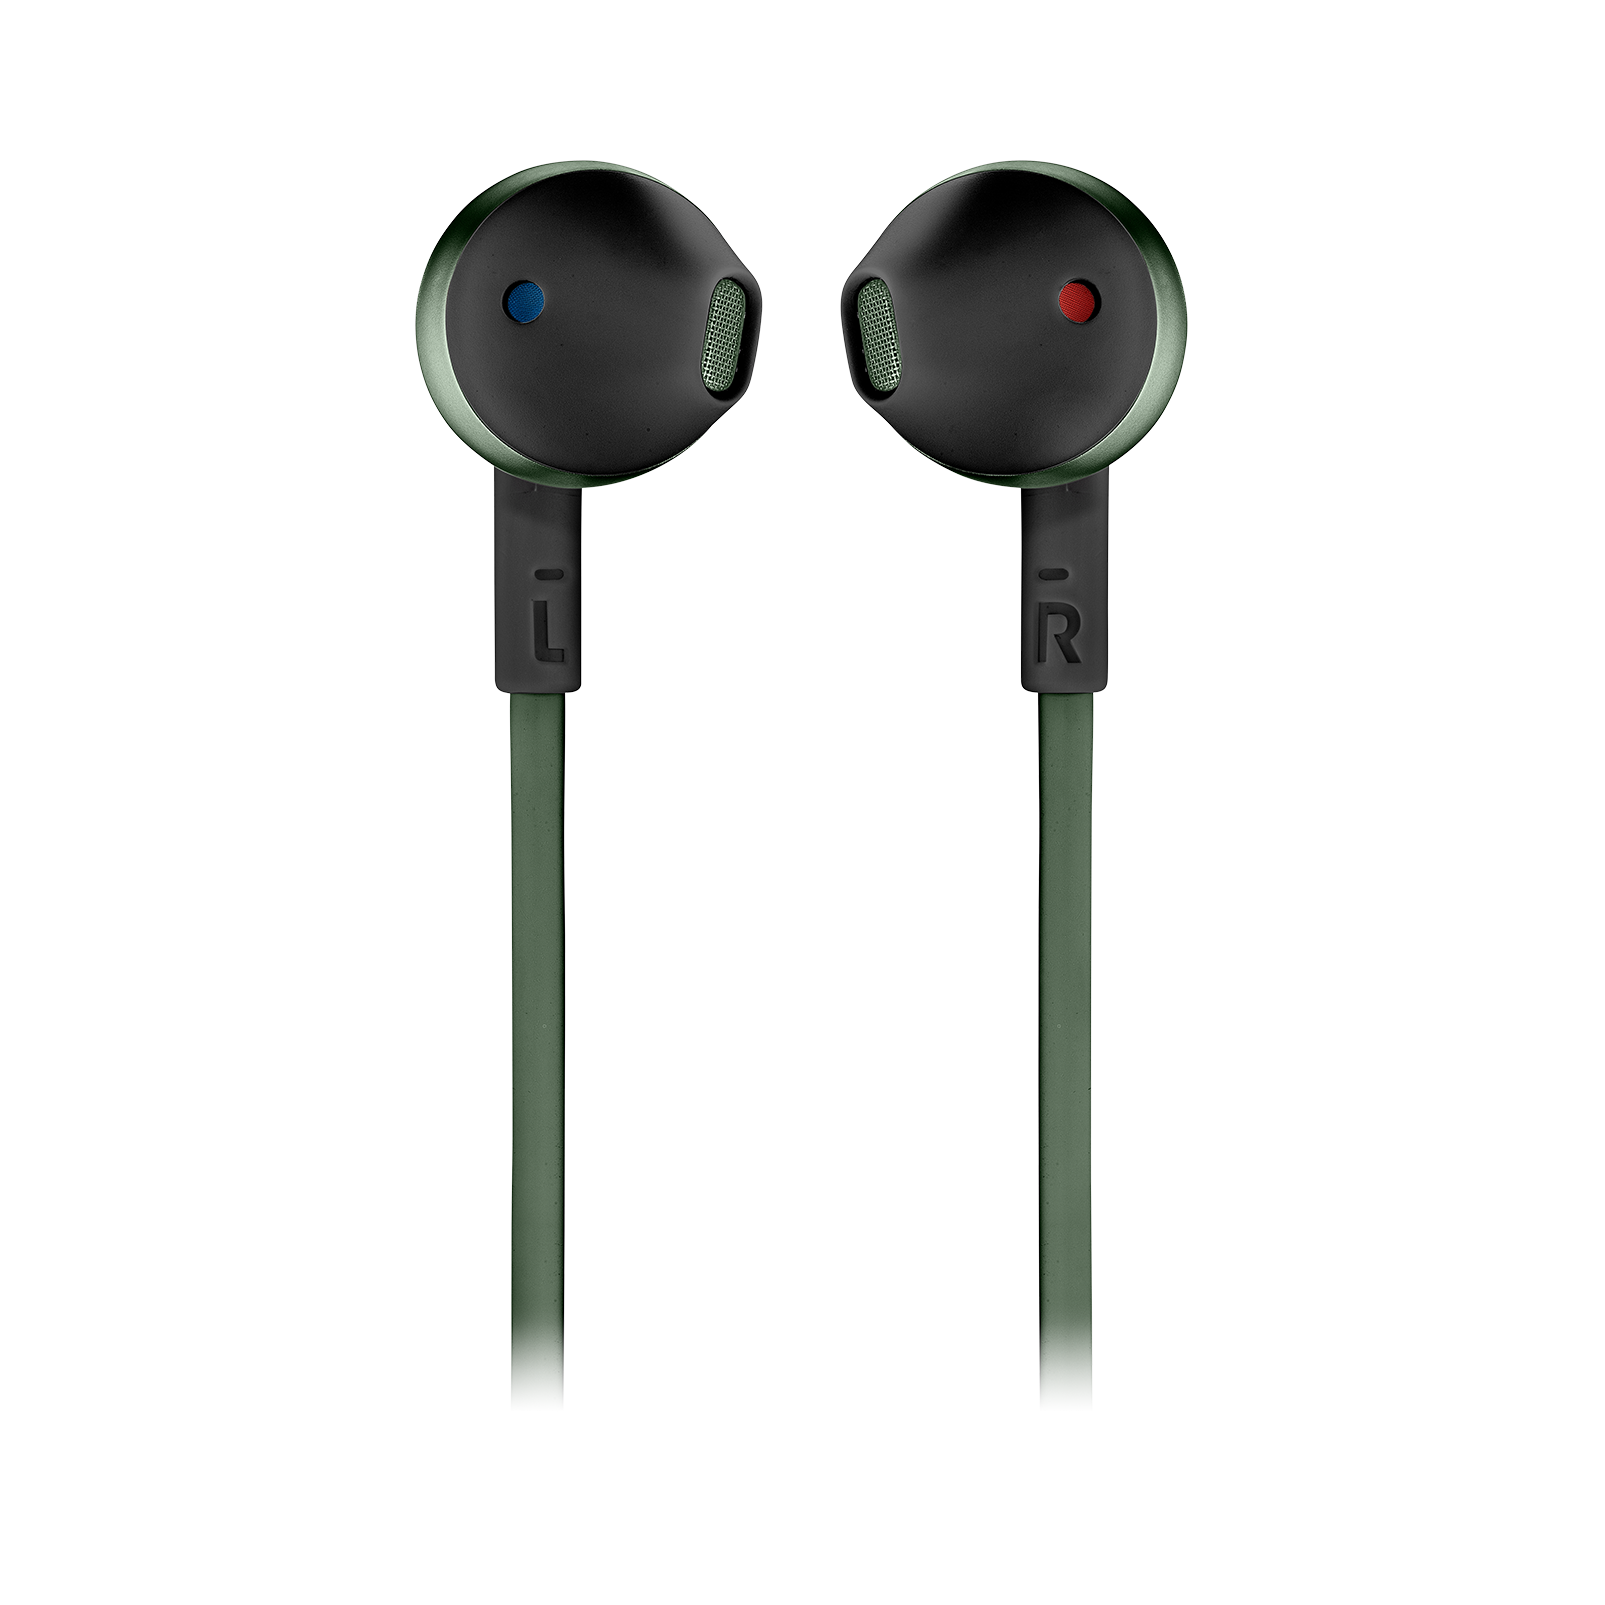 JBL TUNE 205BT - Green - Wireless Earbud headphones - Front